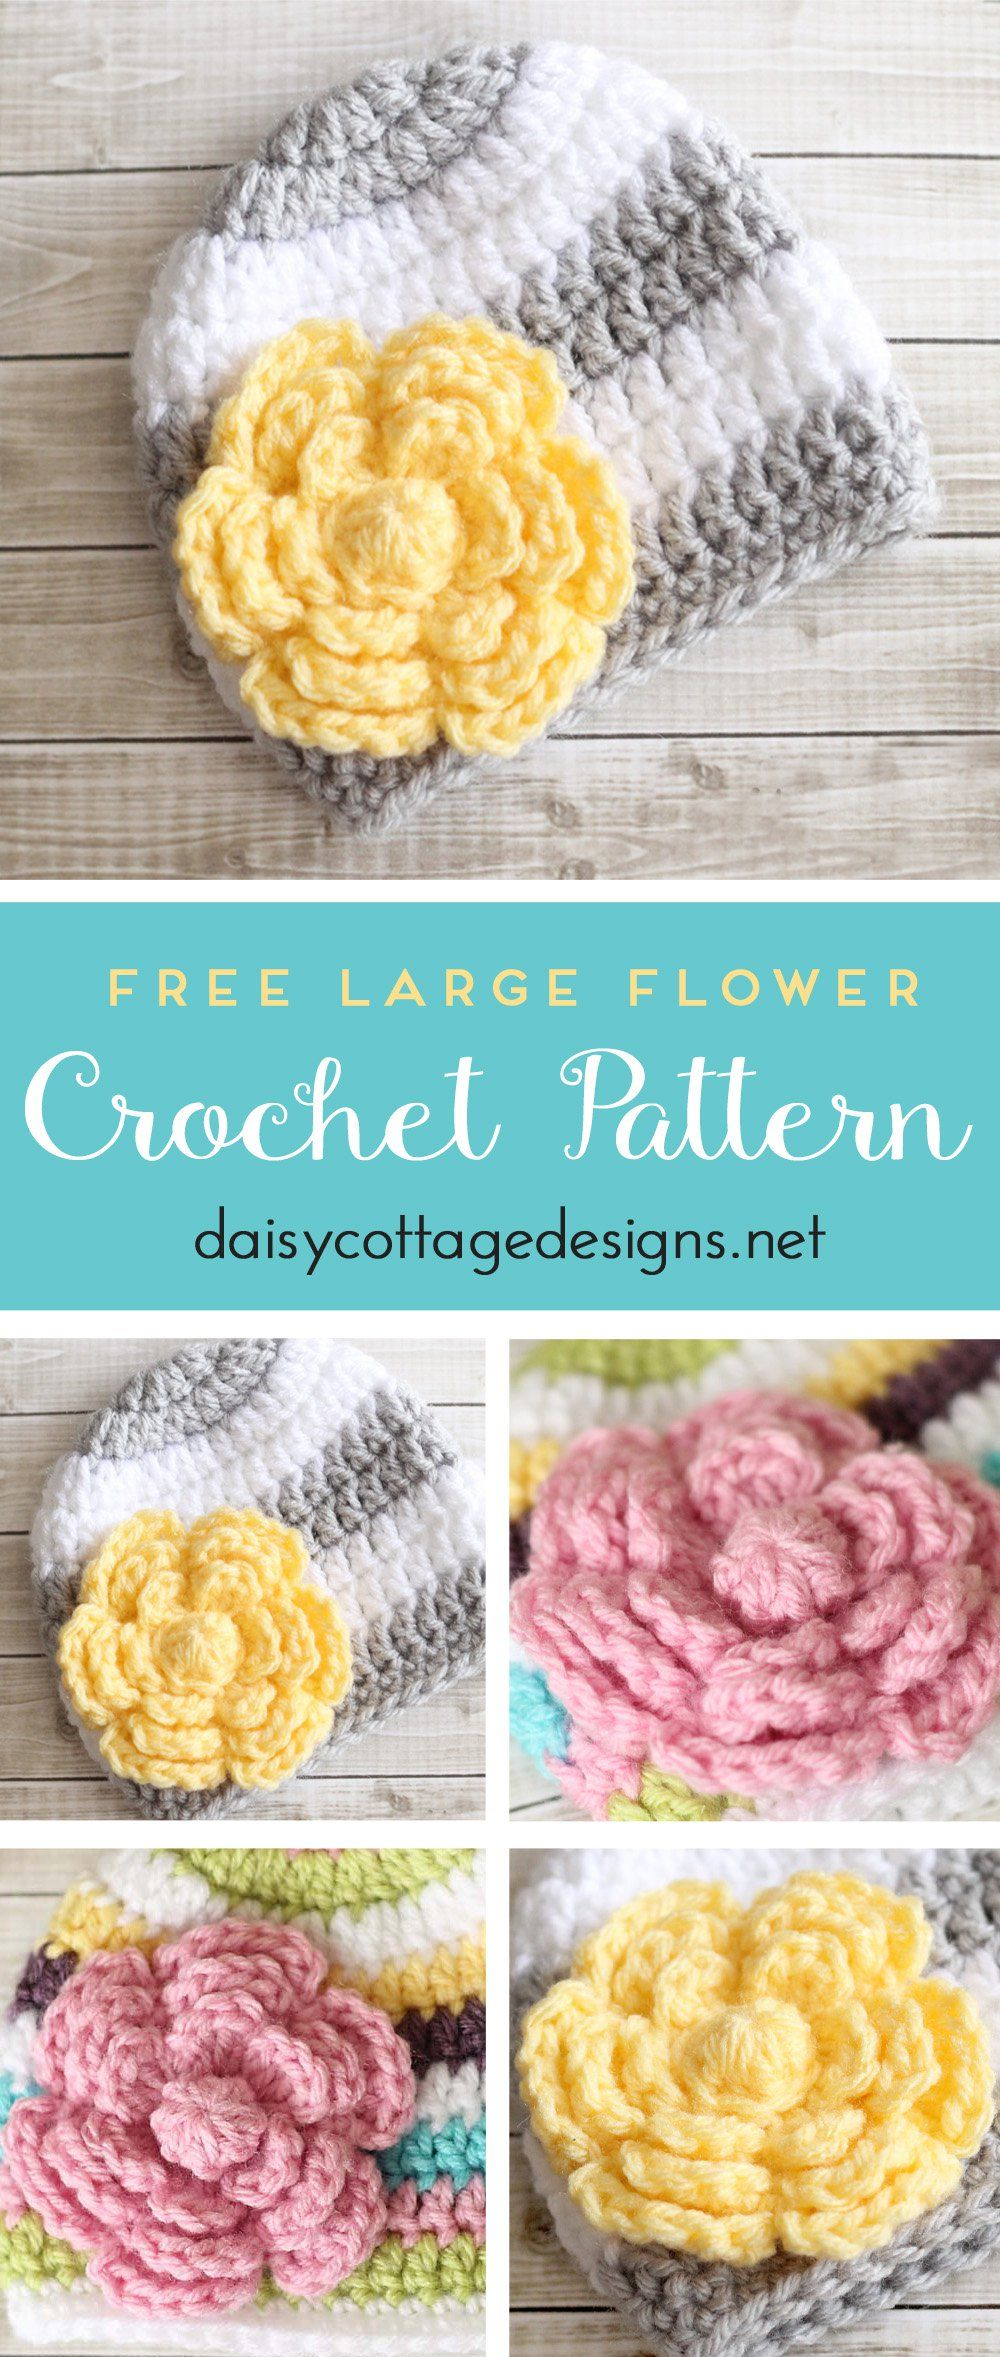 Flower Crochet Pattern Free | Gorros, Tejido y Ganchillo